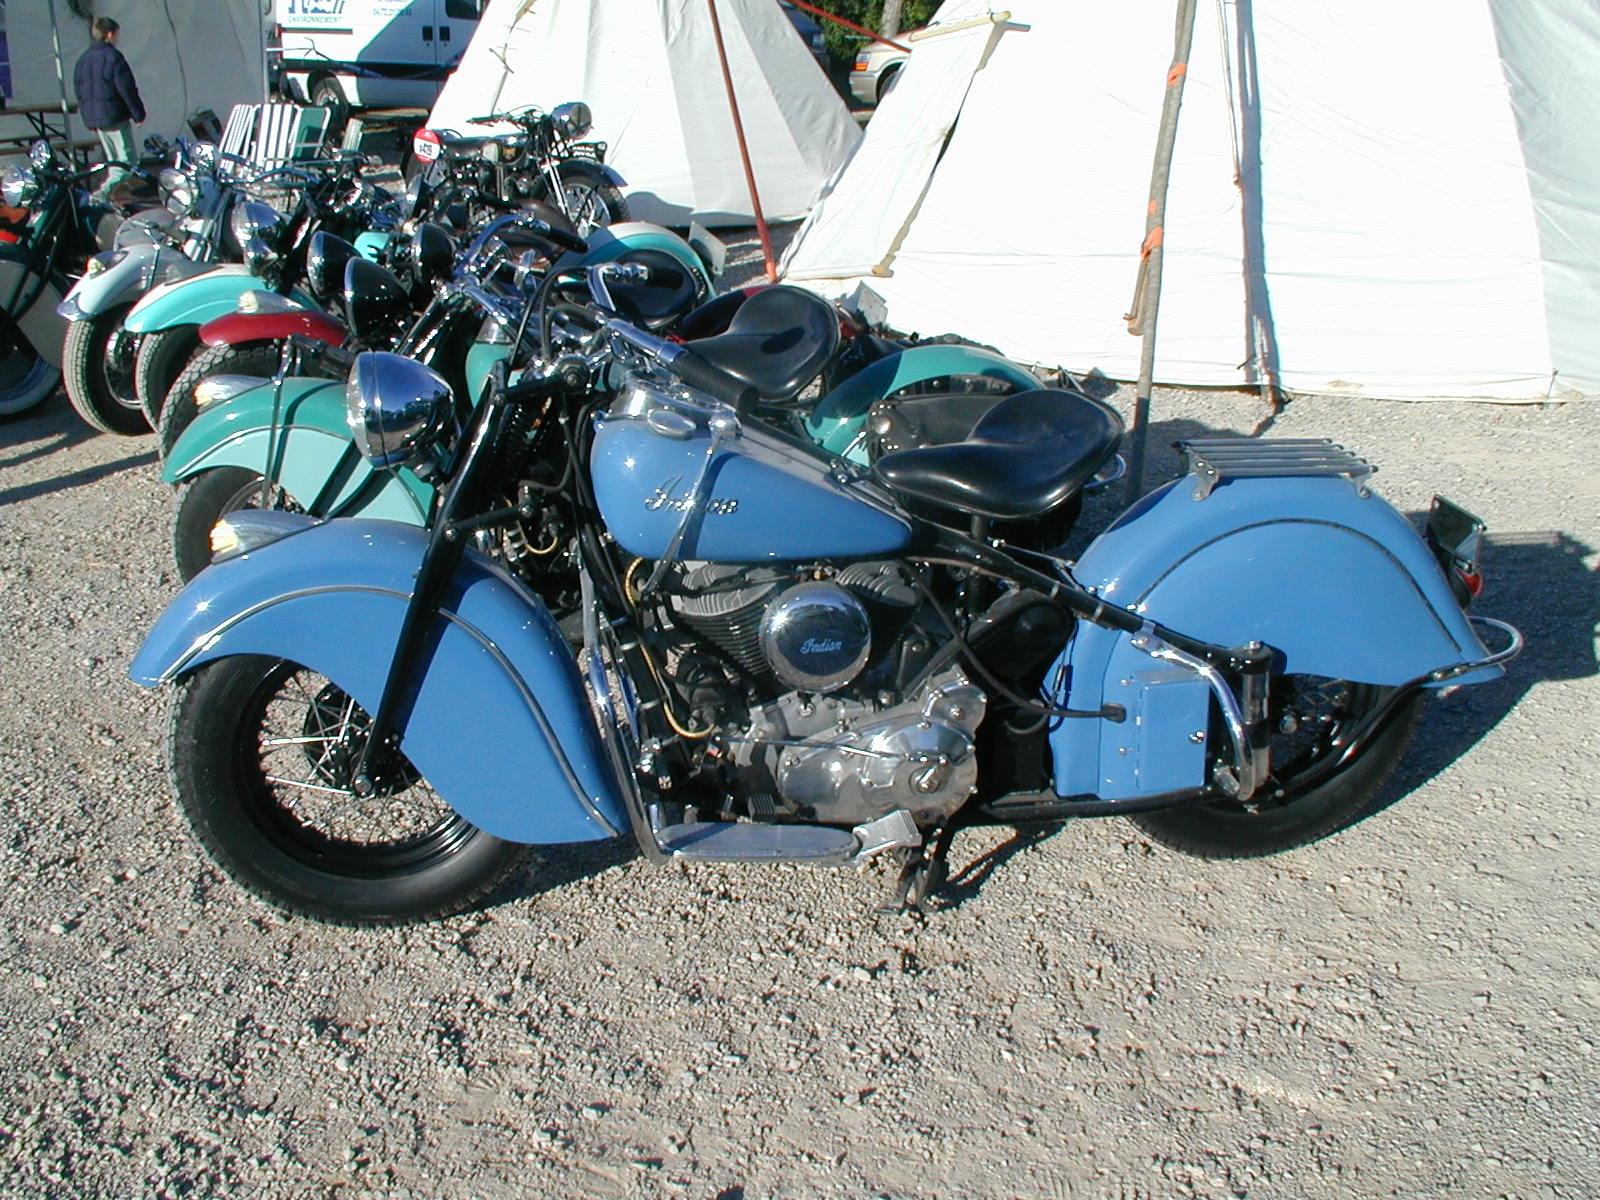 FileIndian Motorcycle In Parking Lot